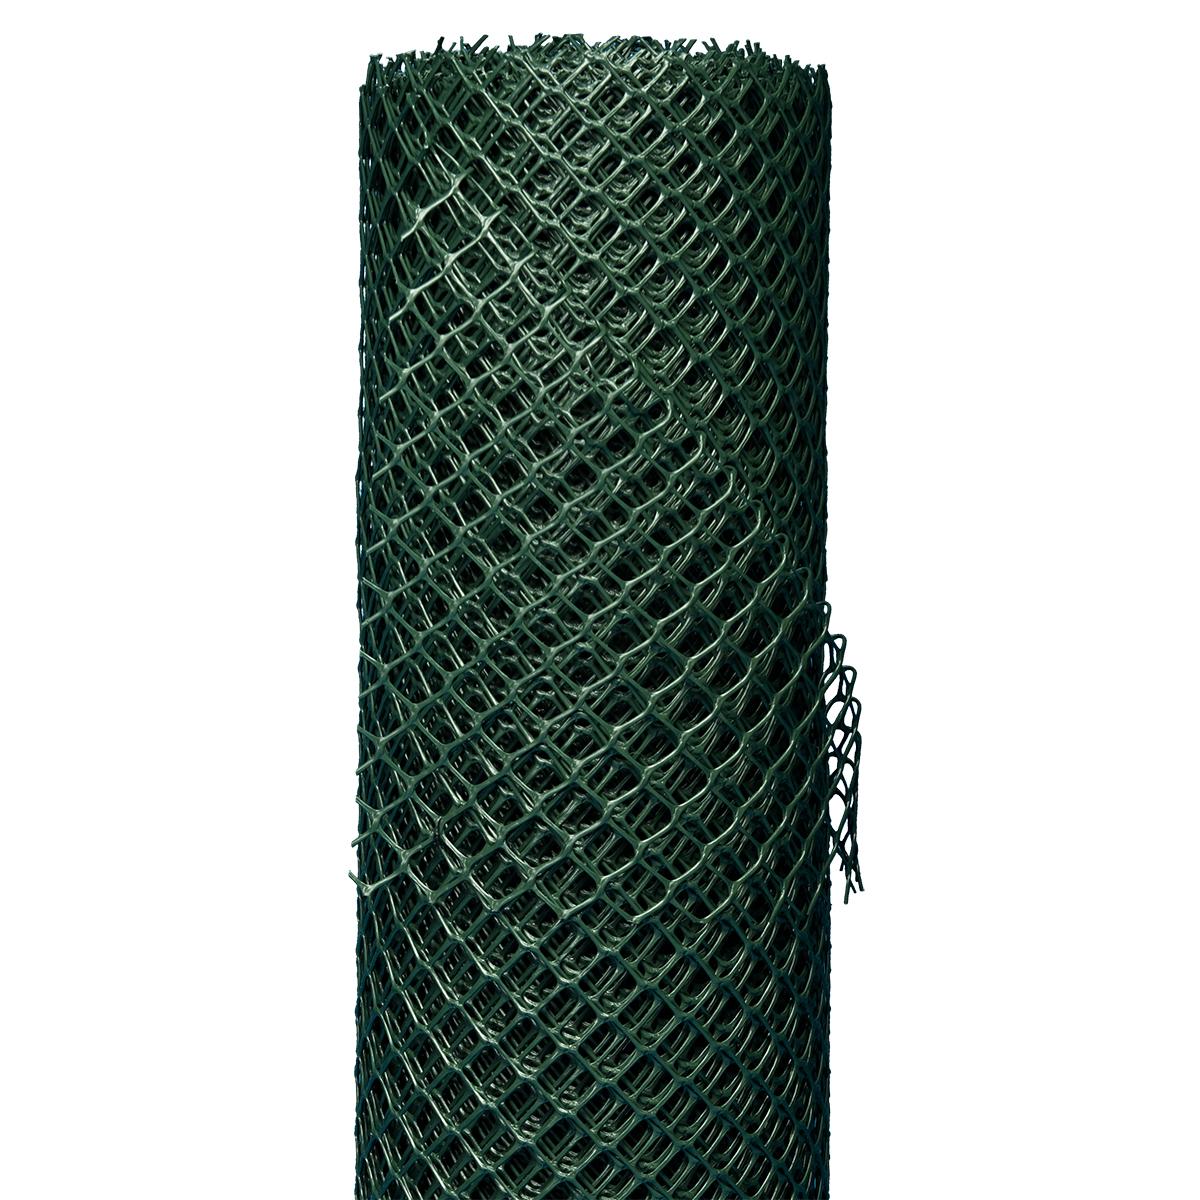 Zaun Gartenzaun Kunststoffzaun Gitterzaun Bauzaun HaGa® 10m Länge x 1,50m Höhe